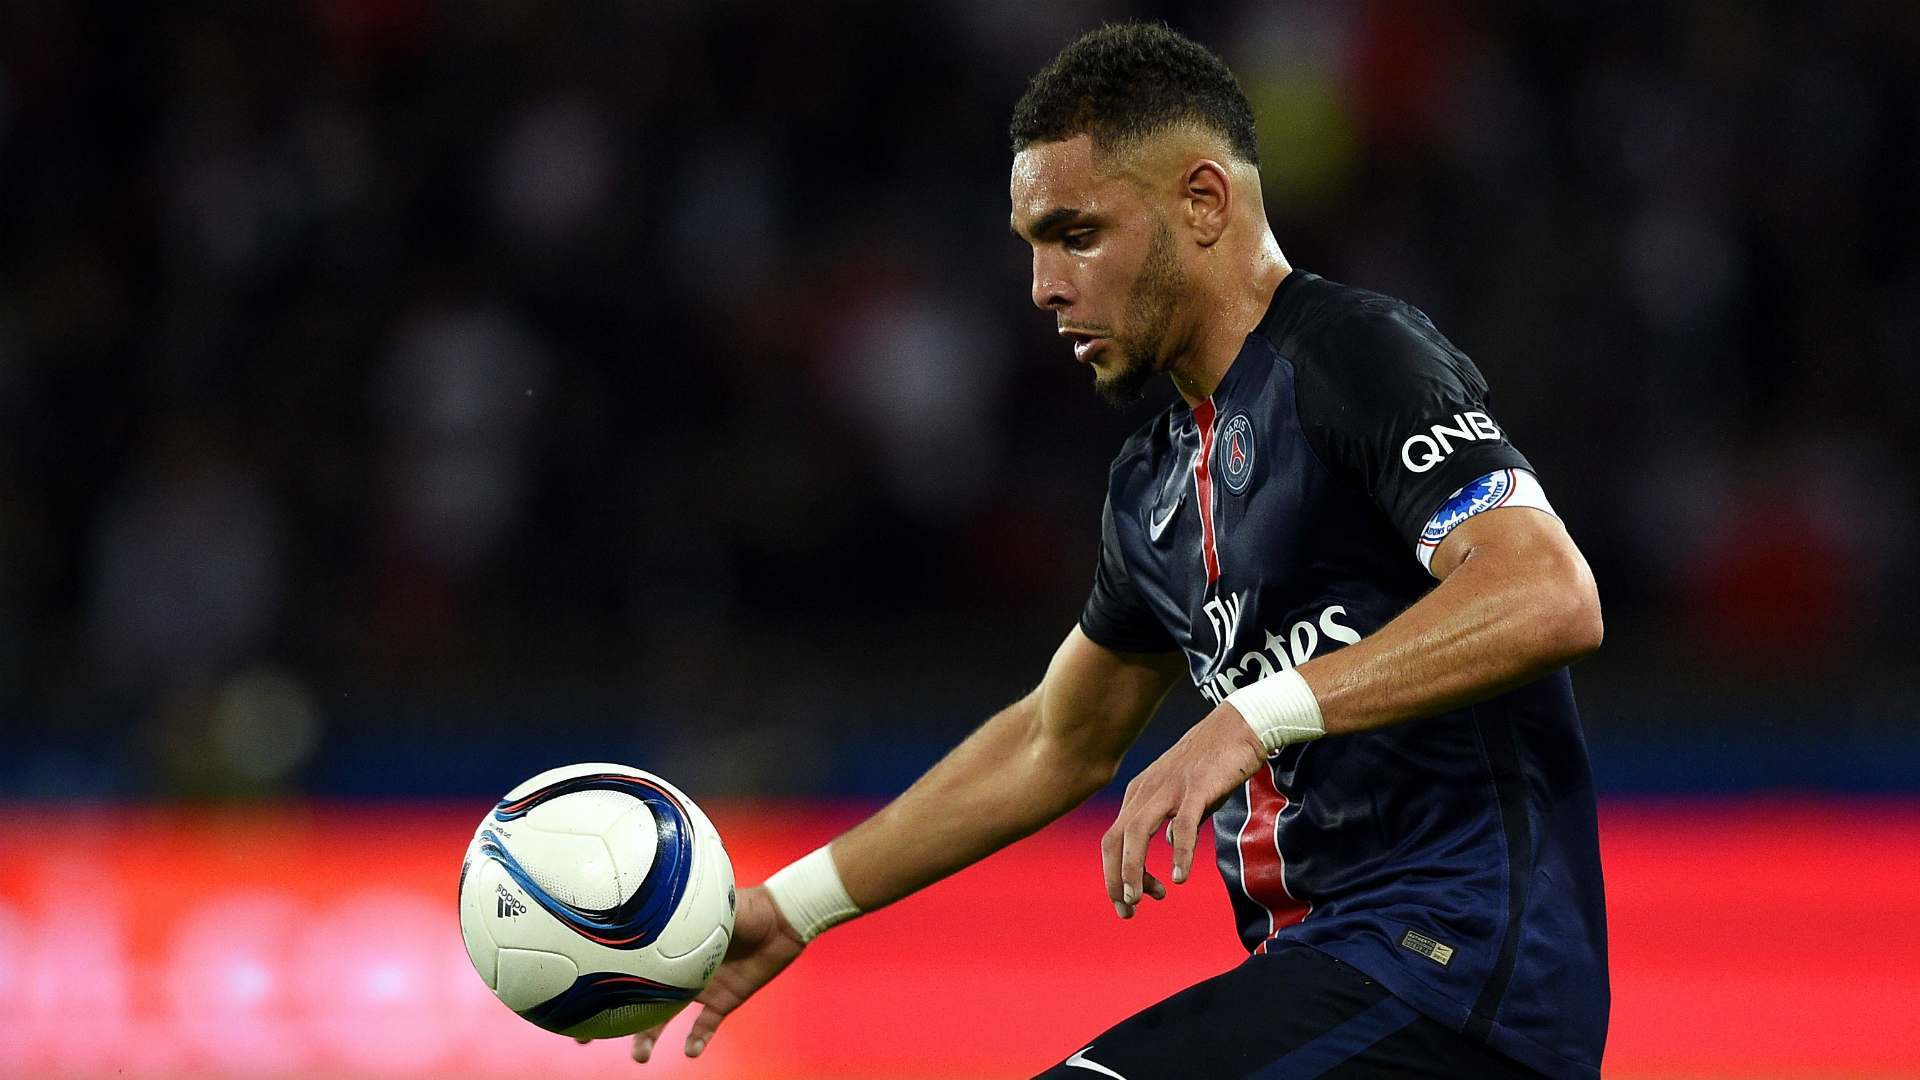 Prediksi Skor Angers vs Paris Saint Germain 28 Mei 2017